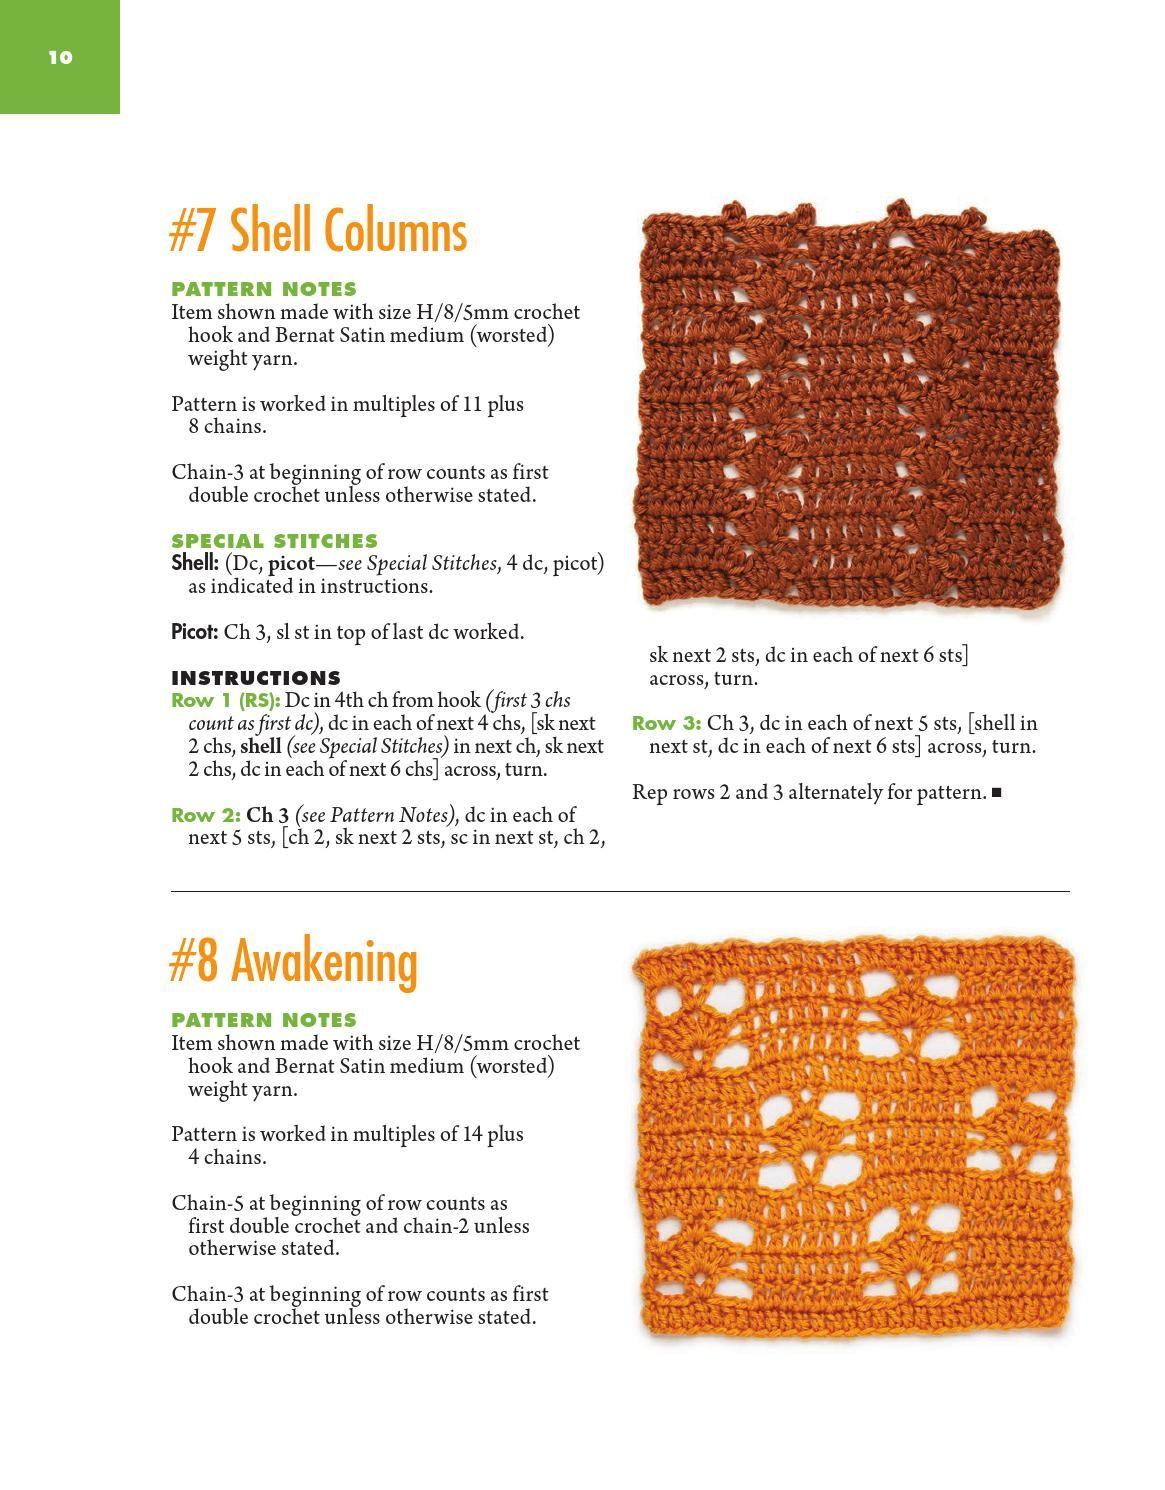 ISSUU - 100 quick & easy crochet stitches sims, darla by tsiisfamke